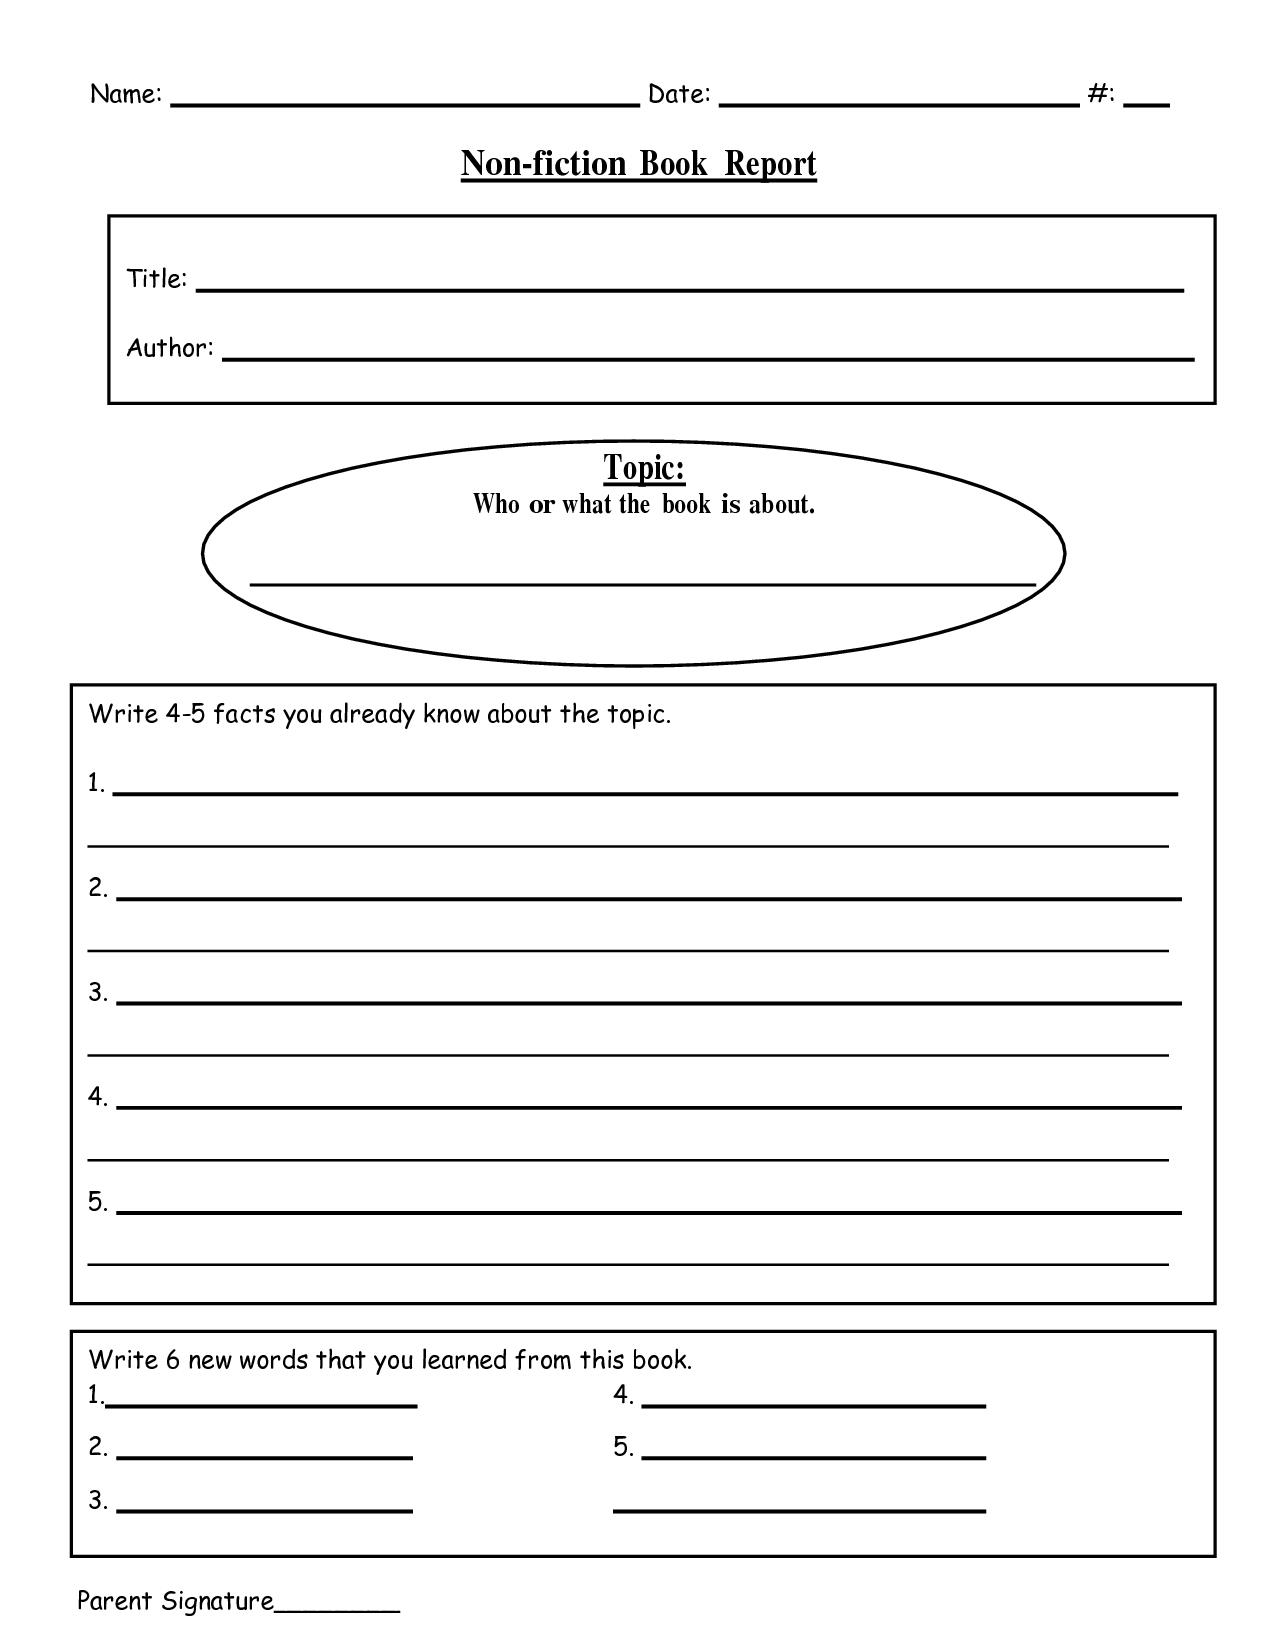 Free Printable Book Report Templates | Non-Fiction Book Report.doc - Free Printable Book Report Forms For Second Grade